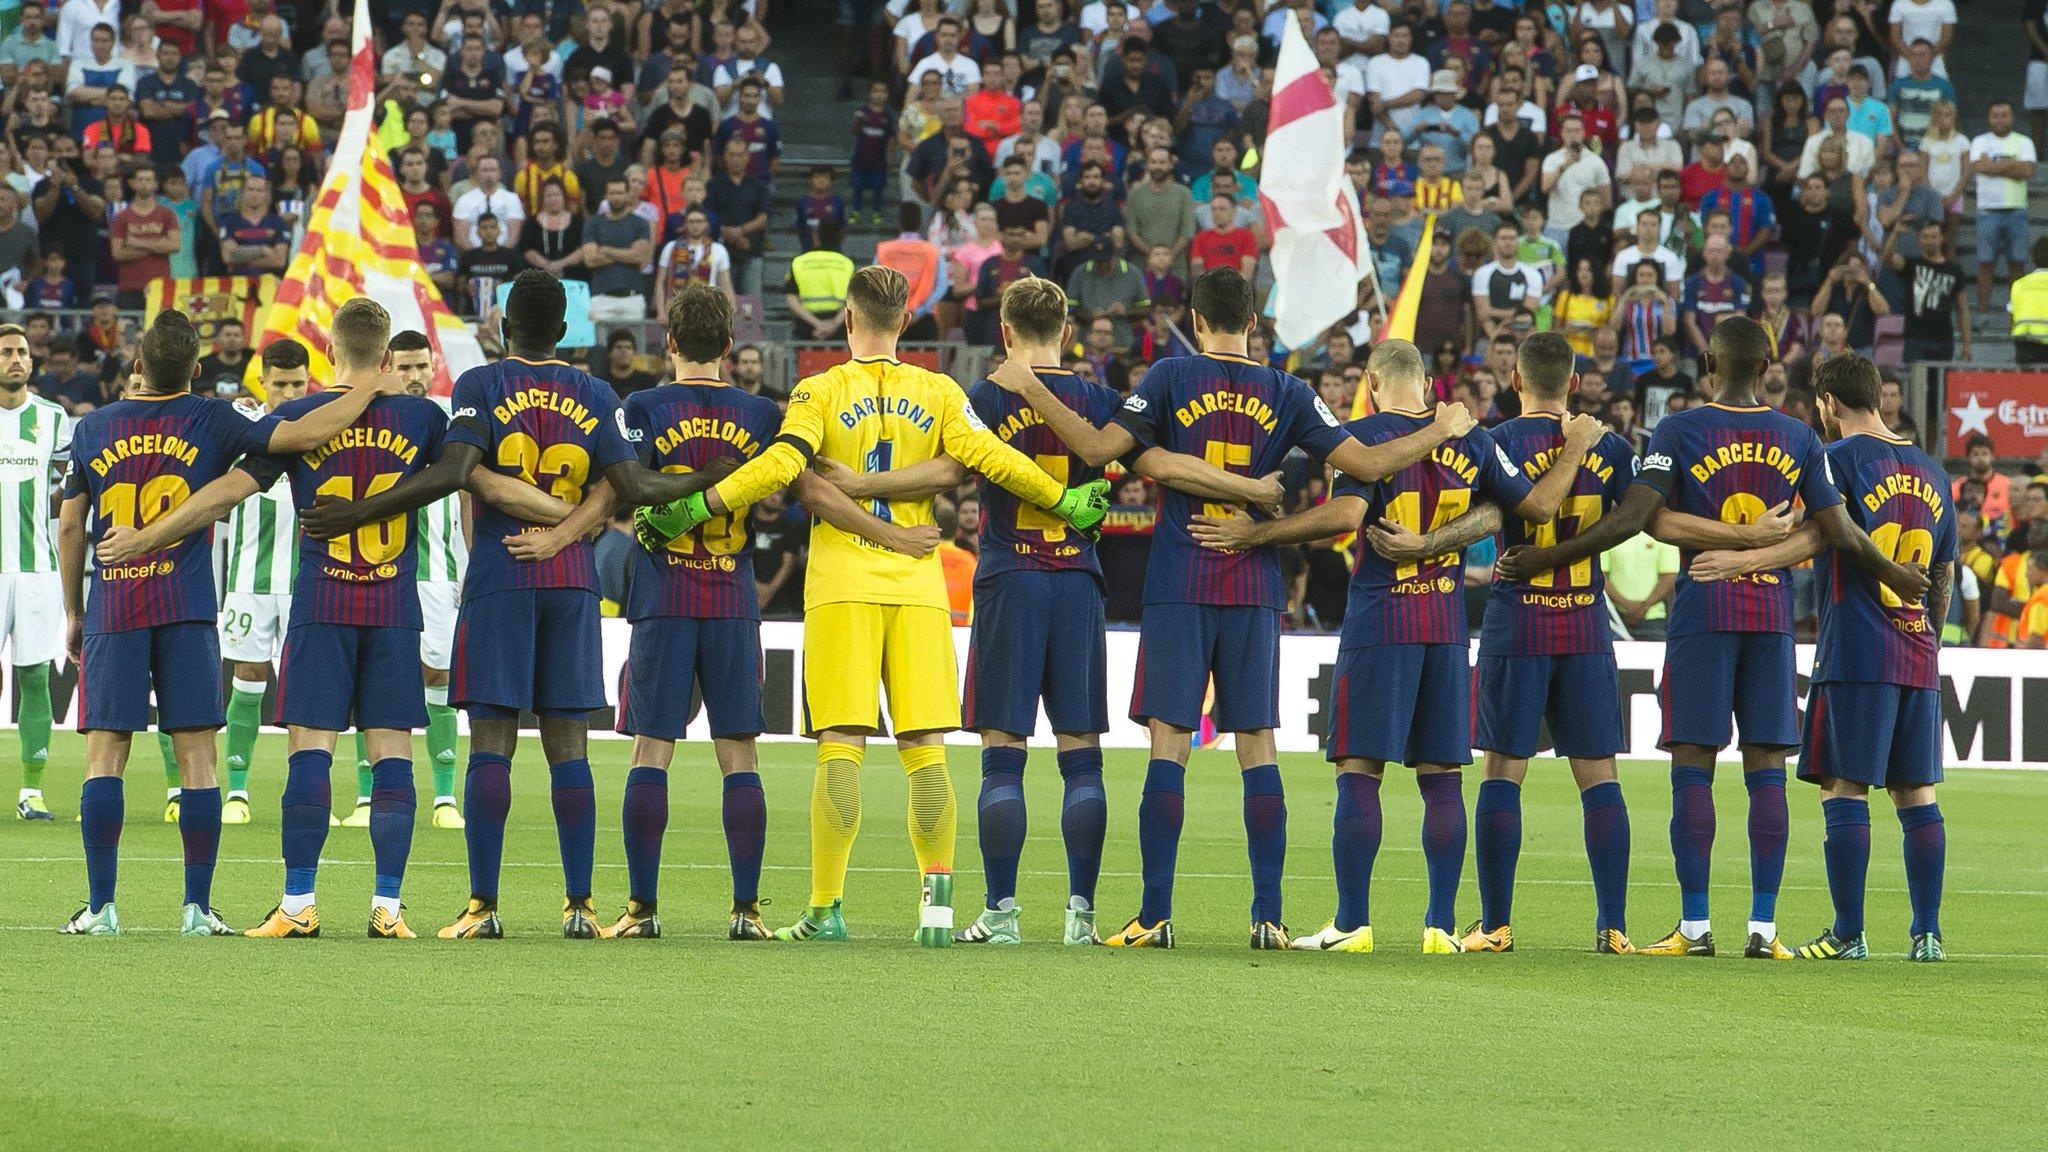 Hilo del FC Barcelona DHsXGP_VwAAMyp8